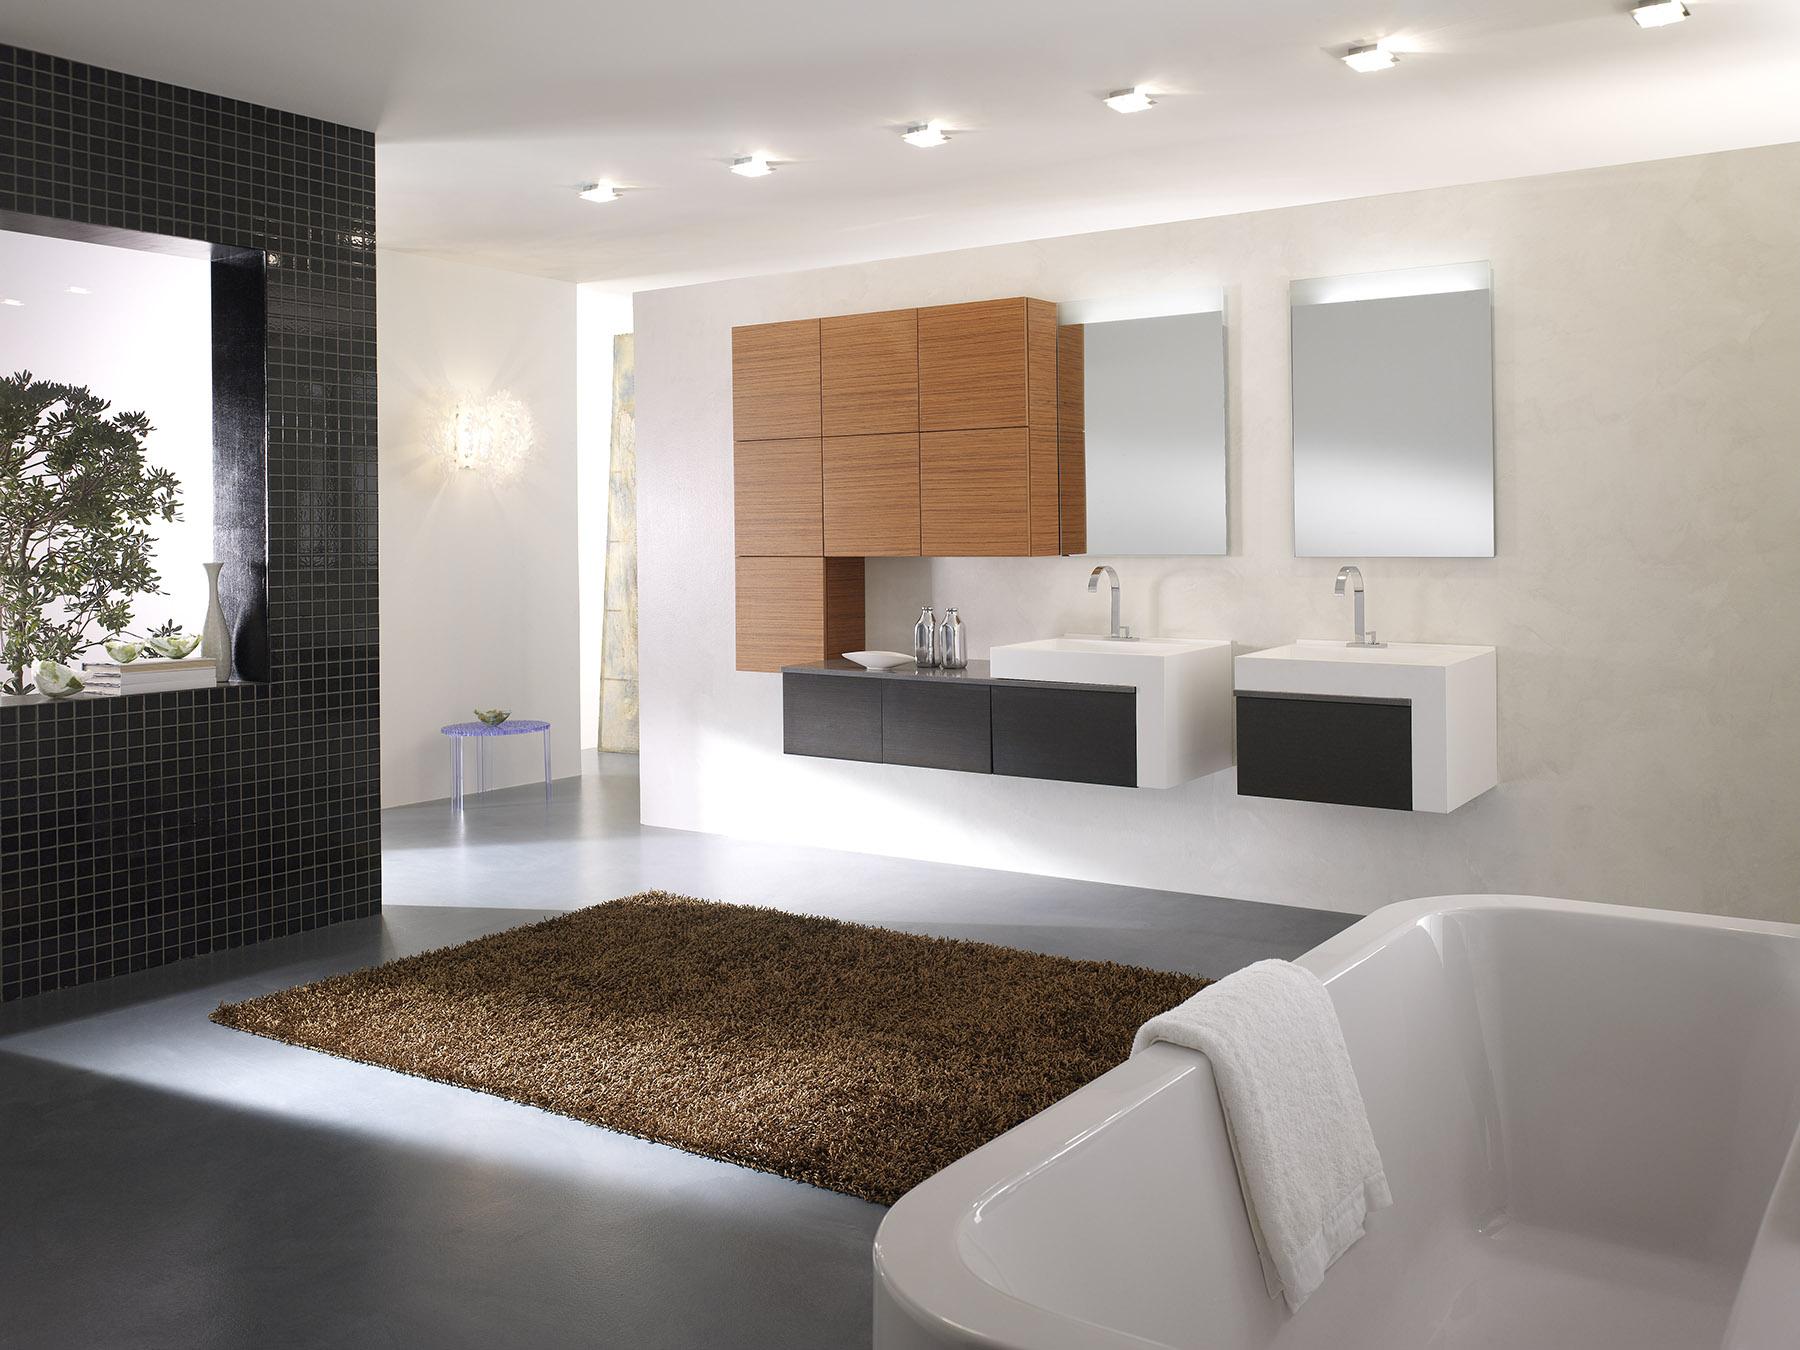 Meuble Salle De Bain Design Contemporain ouf les meubles de salle de bains changent. tom. incroyable